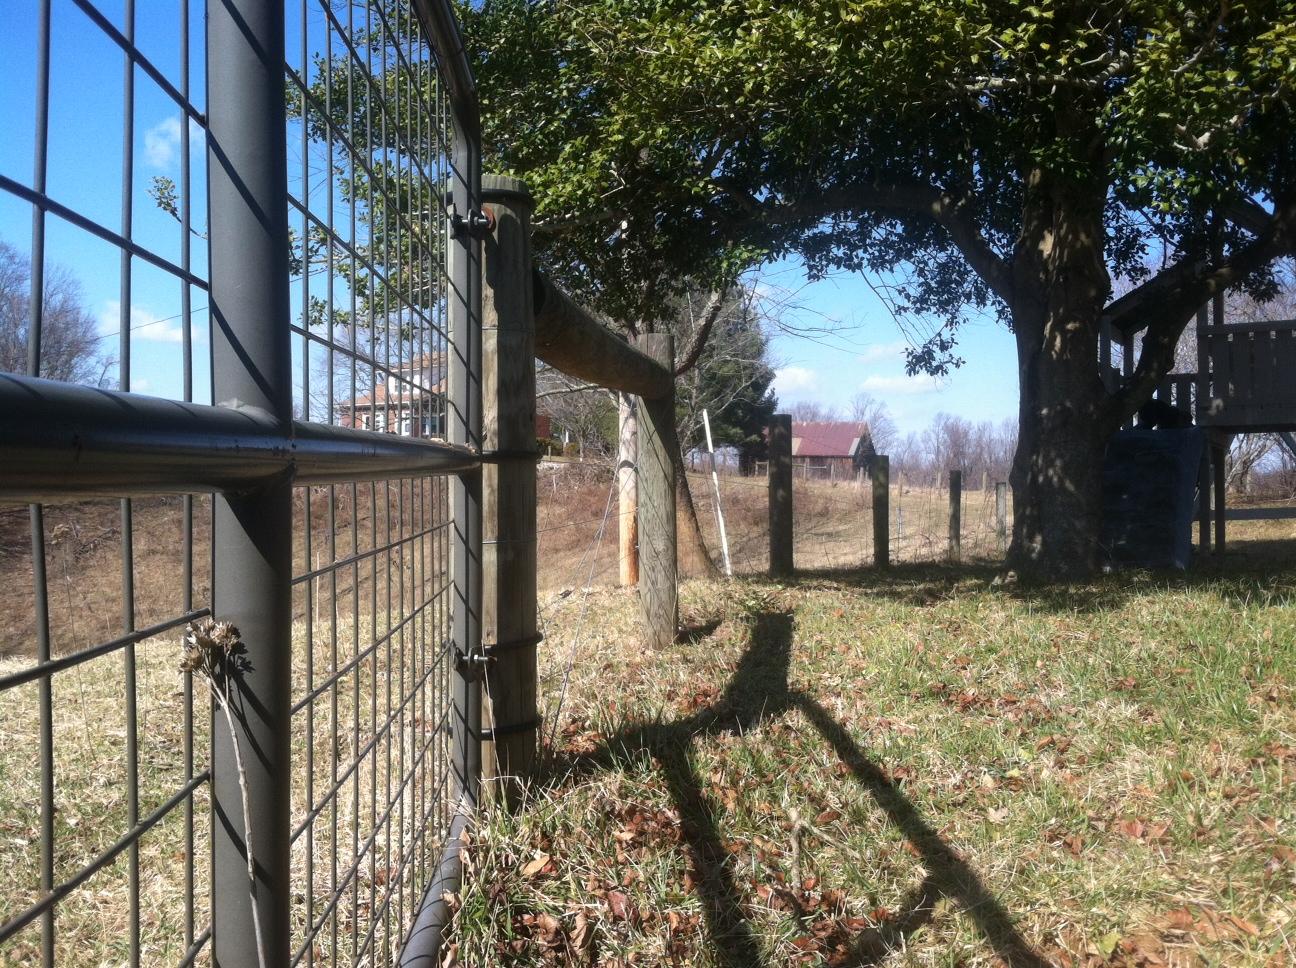 monnett-farms-fence.JPG